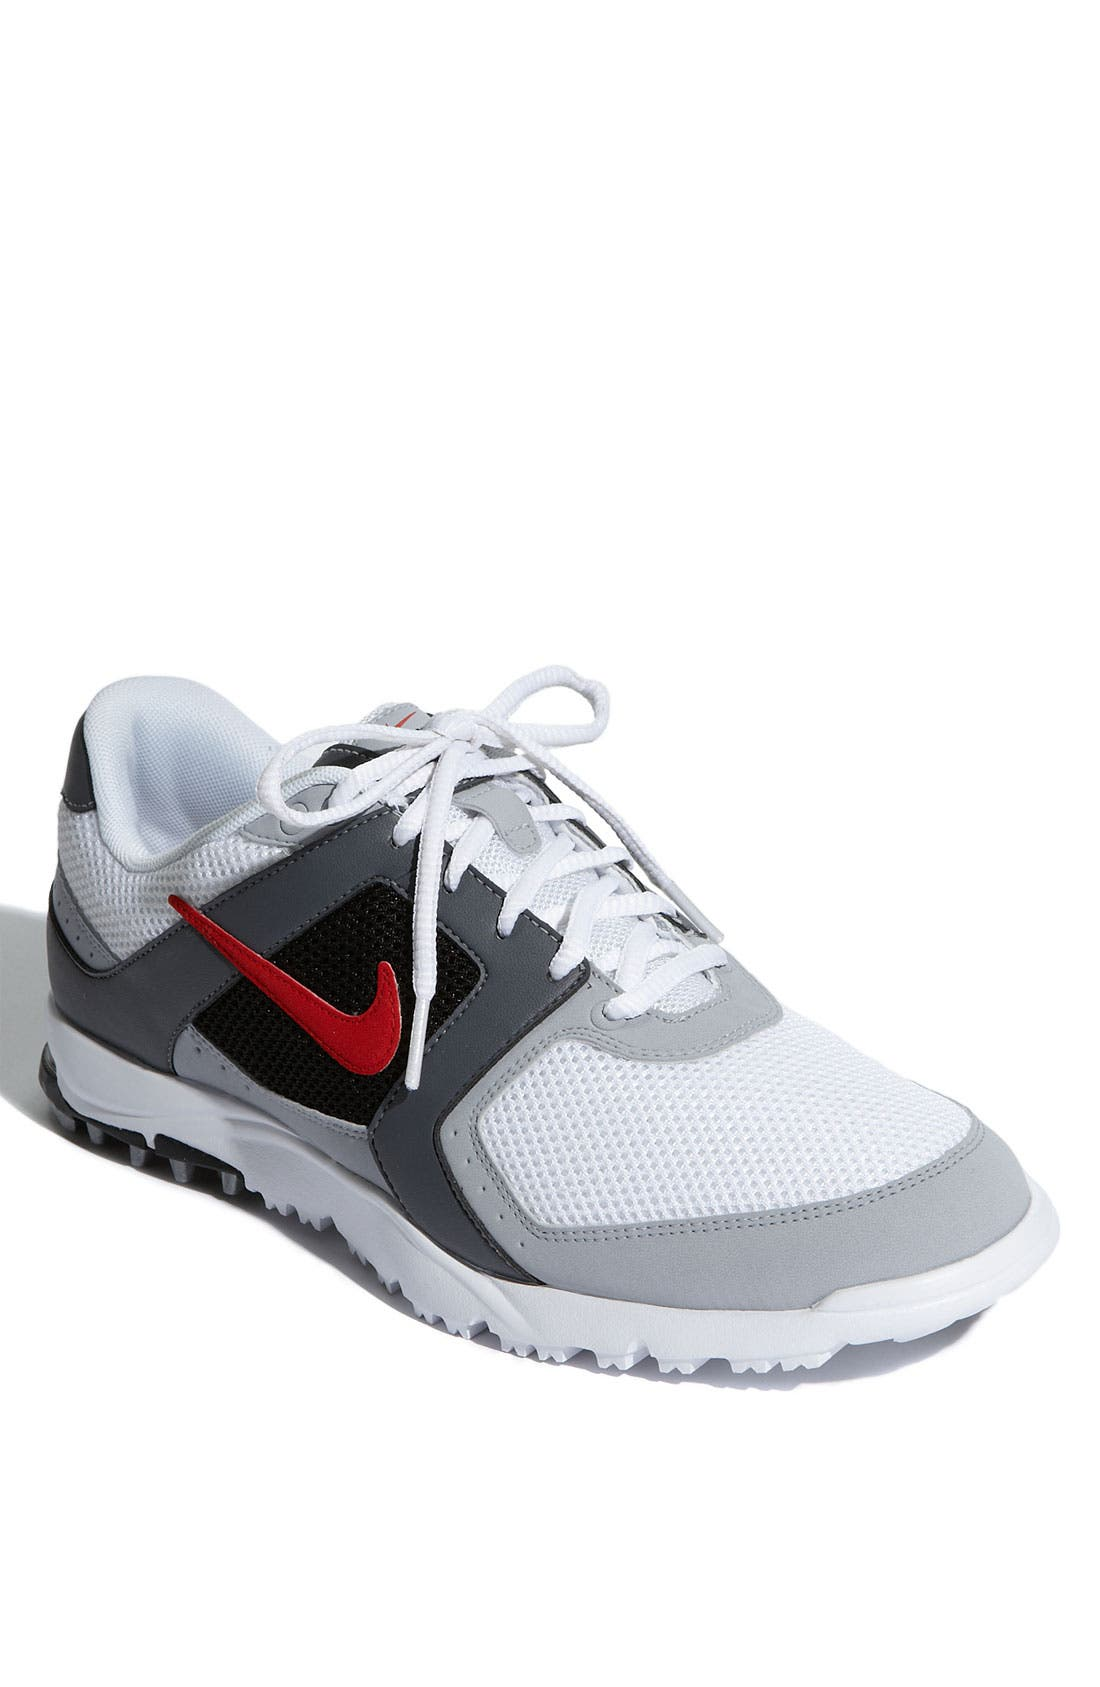 Alternate Image 1 Selected - Nike 'Air Range WP' Golf Shoe (Men)